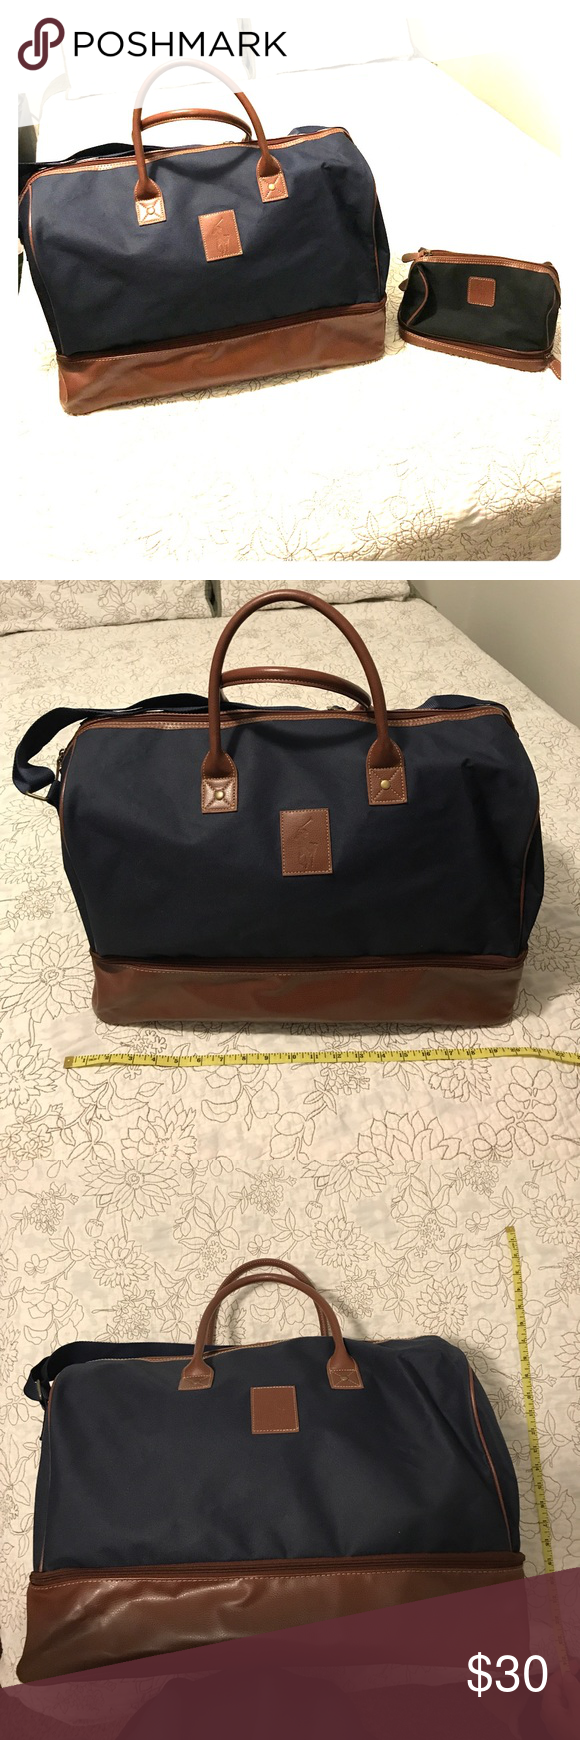 7b53d104c81 Polo Ralph Lauren Luggage Sets